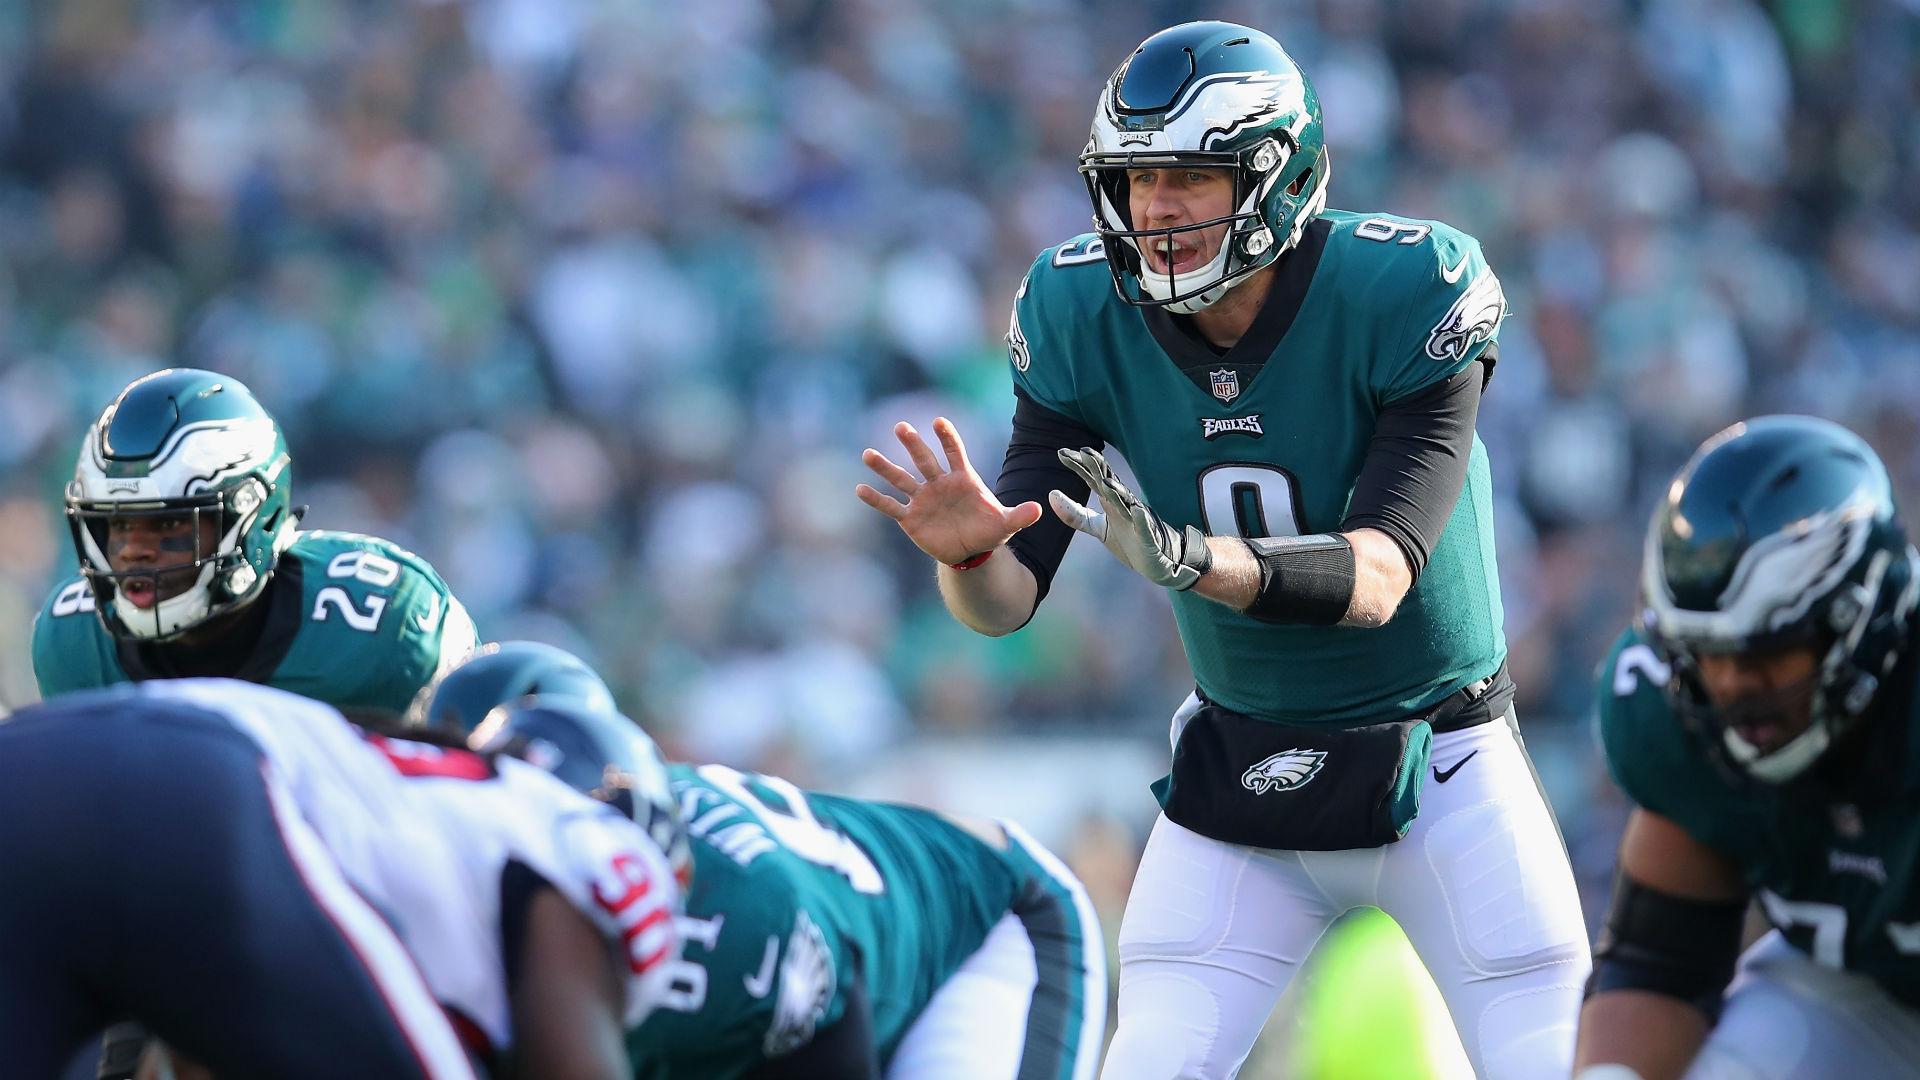 Eagles QB Nick Foles will start vs. Redskins, coach Doug Pederson says